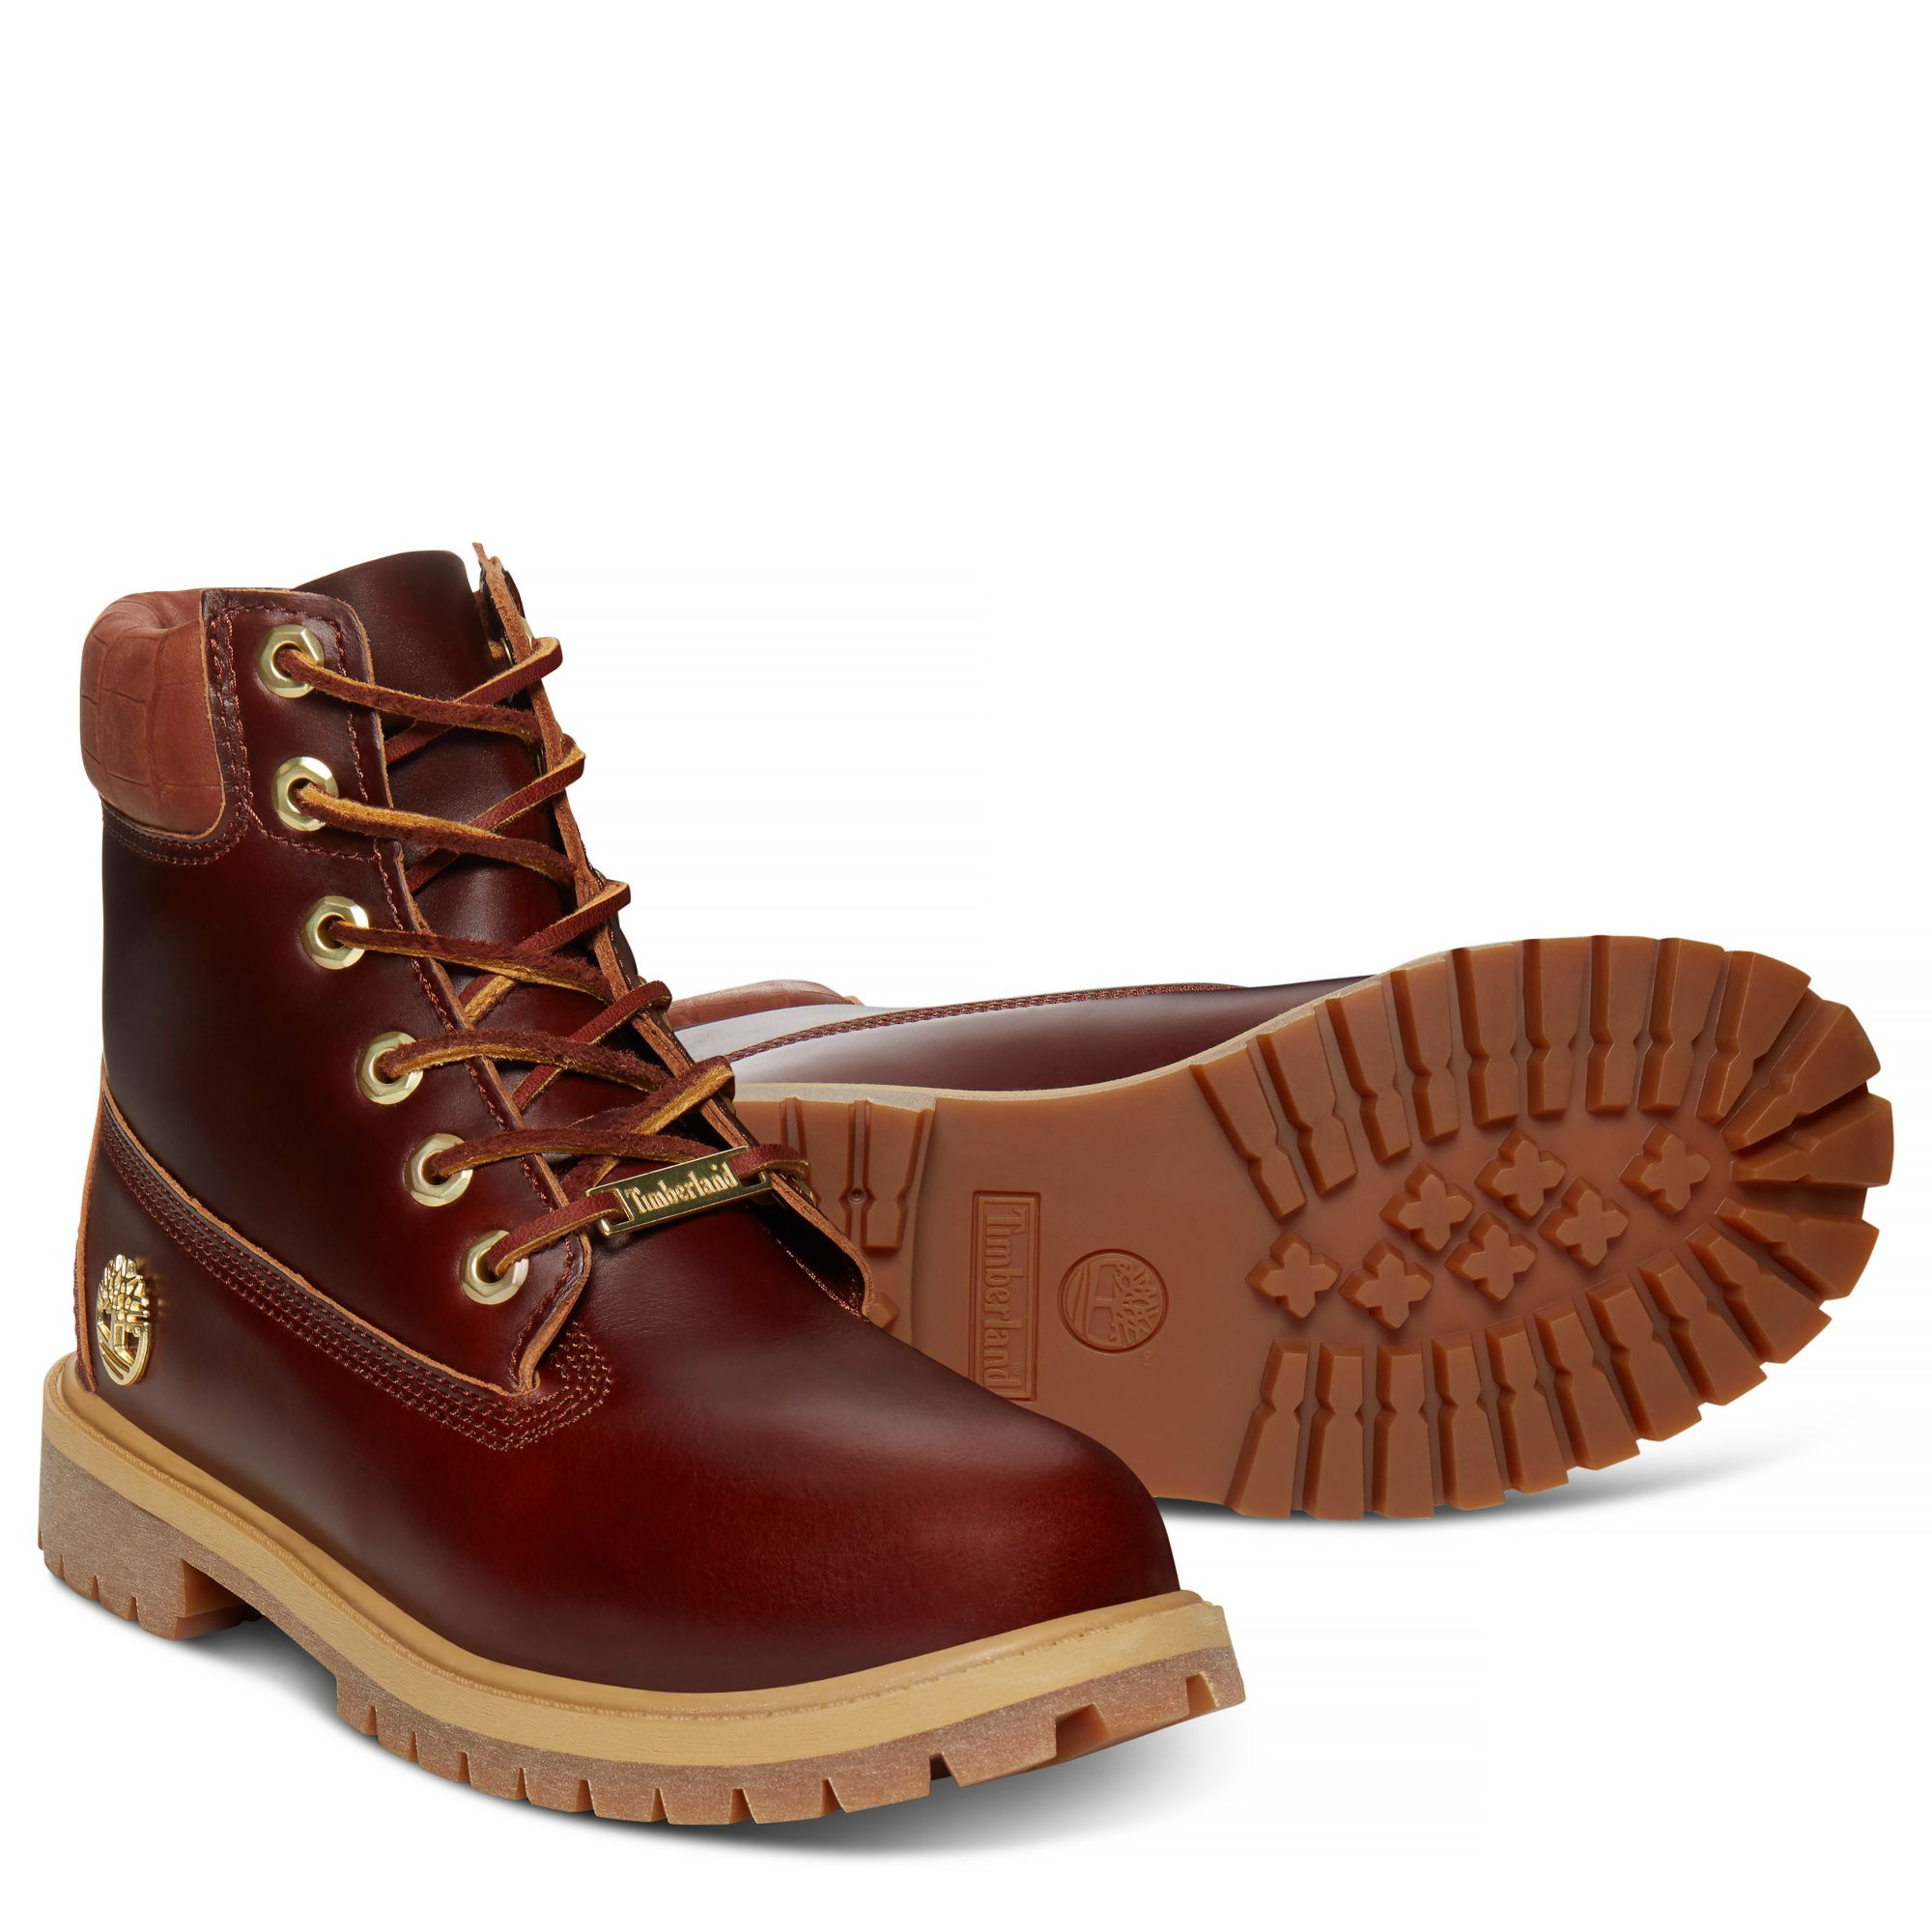 Timberland Junior 6 Inch Boot Dark Brown Reptile At 120 Love The Trumph Phantom Boots Darkbrown 4